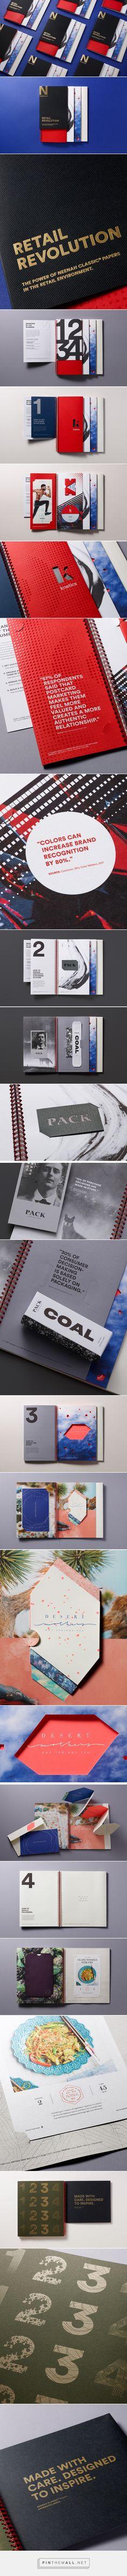 Neenah Paper | Retail Revolution Promo on Behance - created via https://pinthemall.net